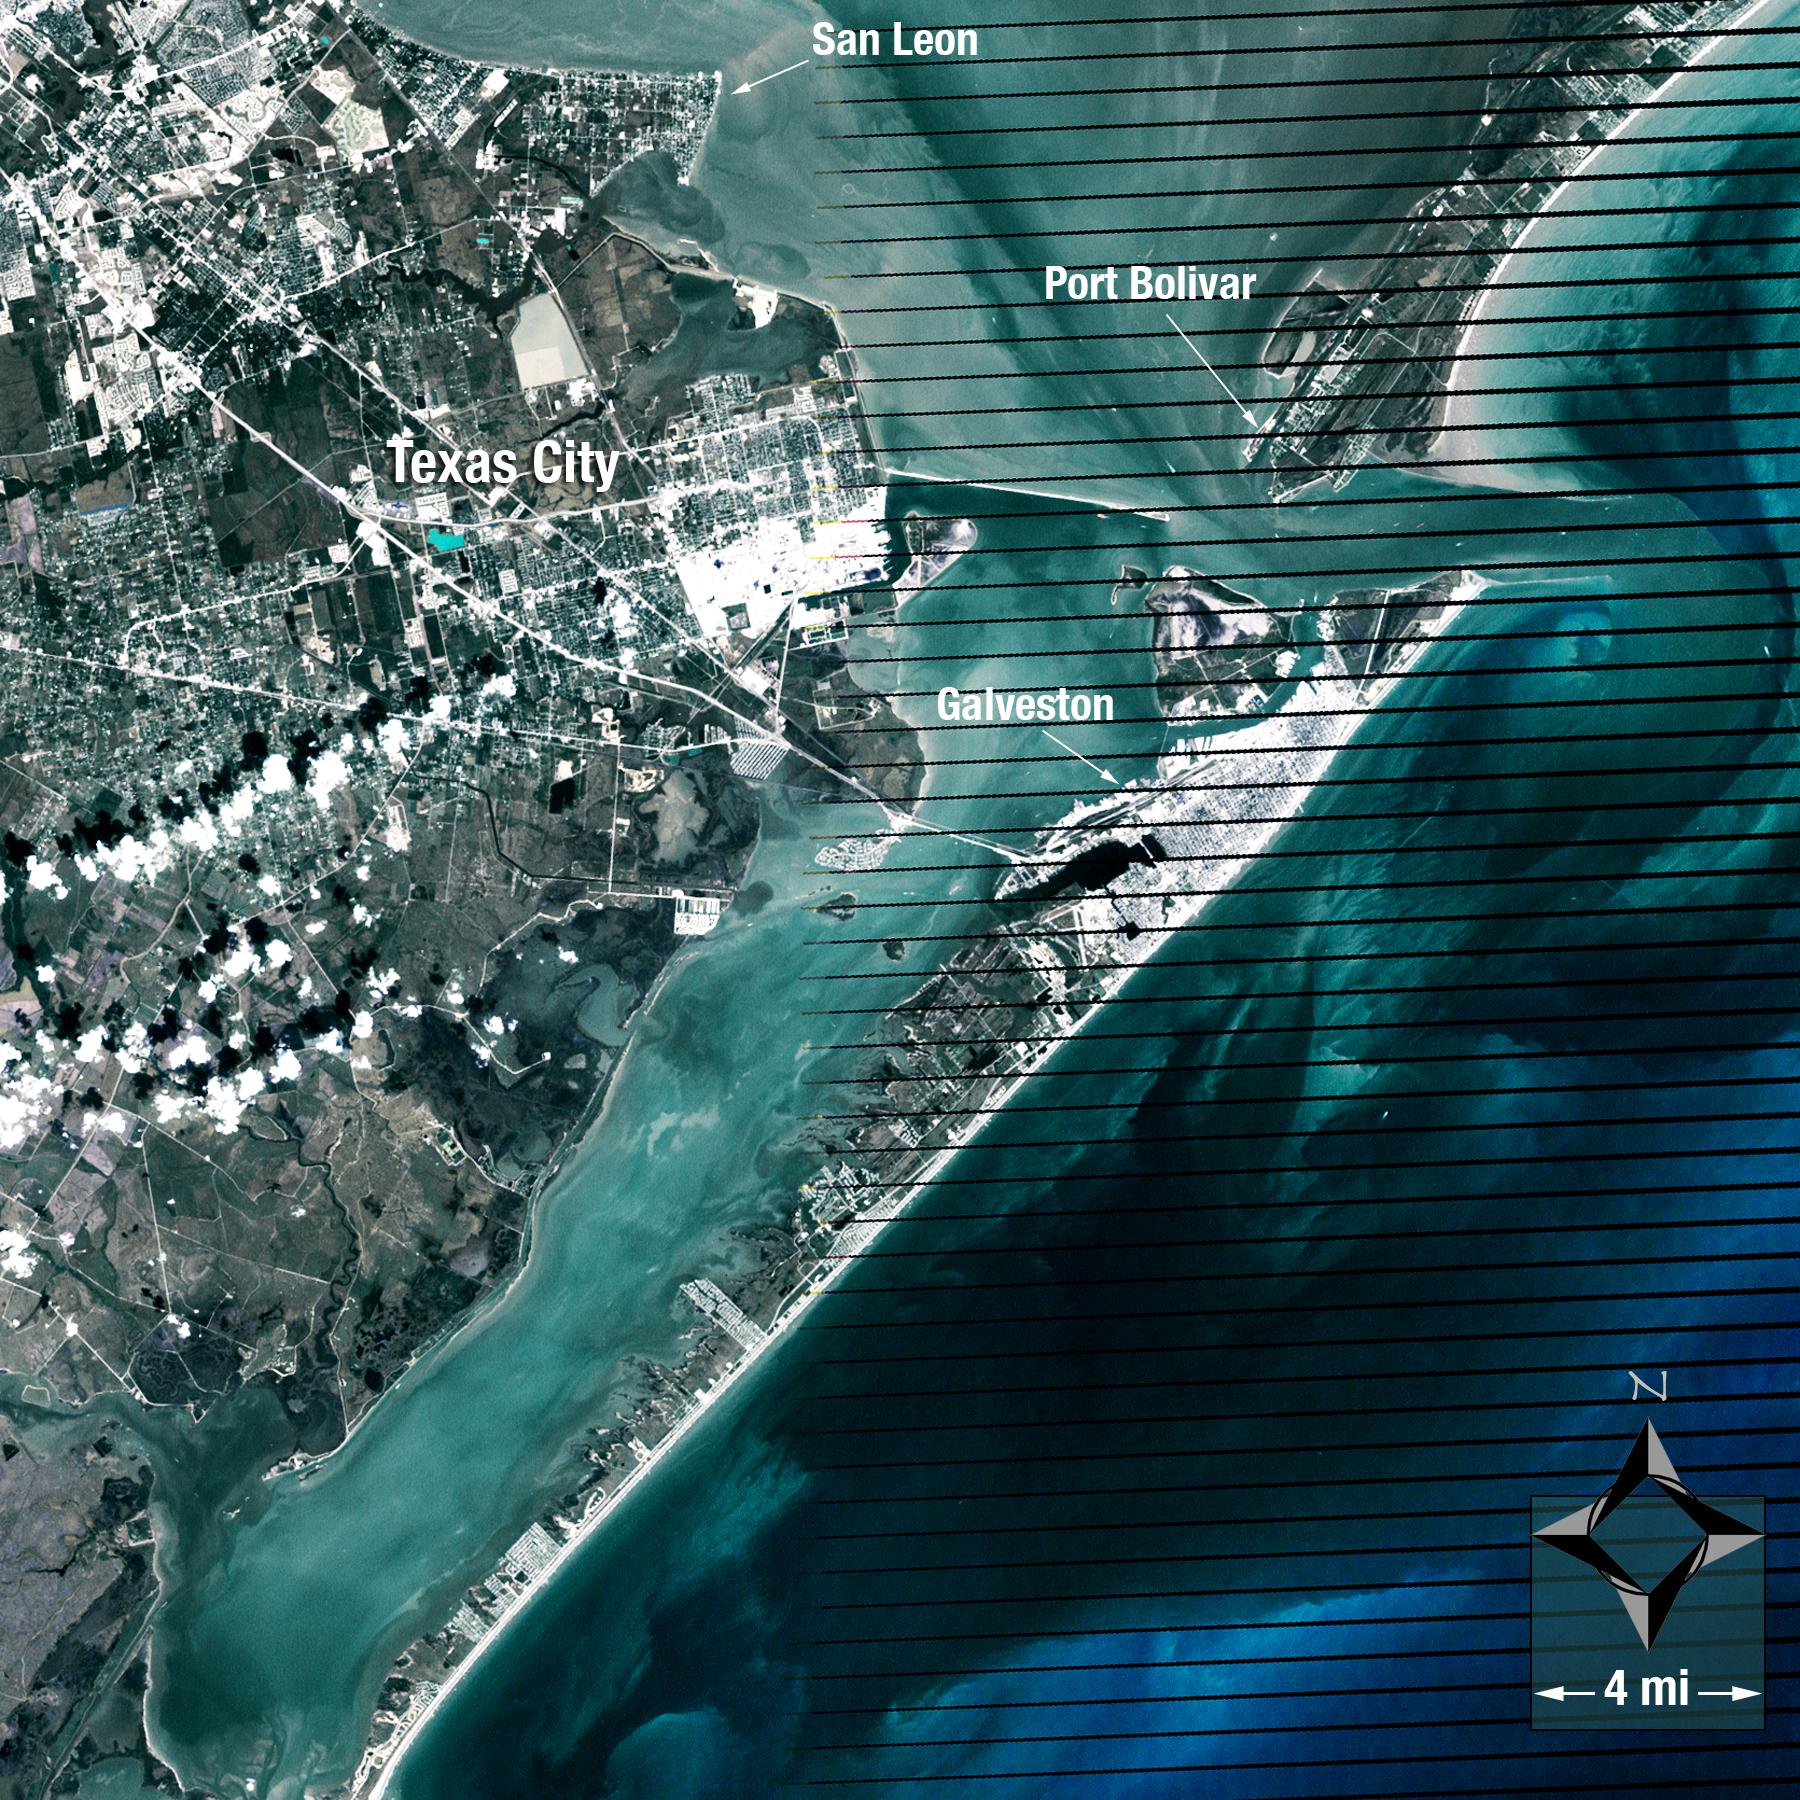 2008 Idea House In Galvestion Texas: Hurricane Season 2008: Hurricane Ike (Atlantic Ocean